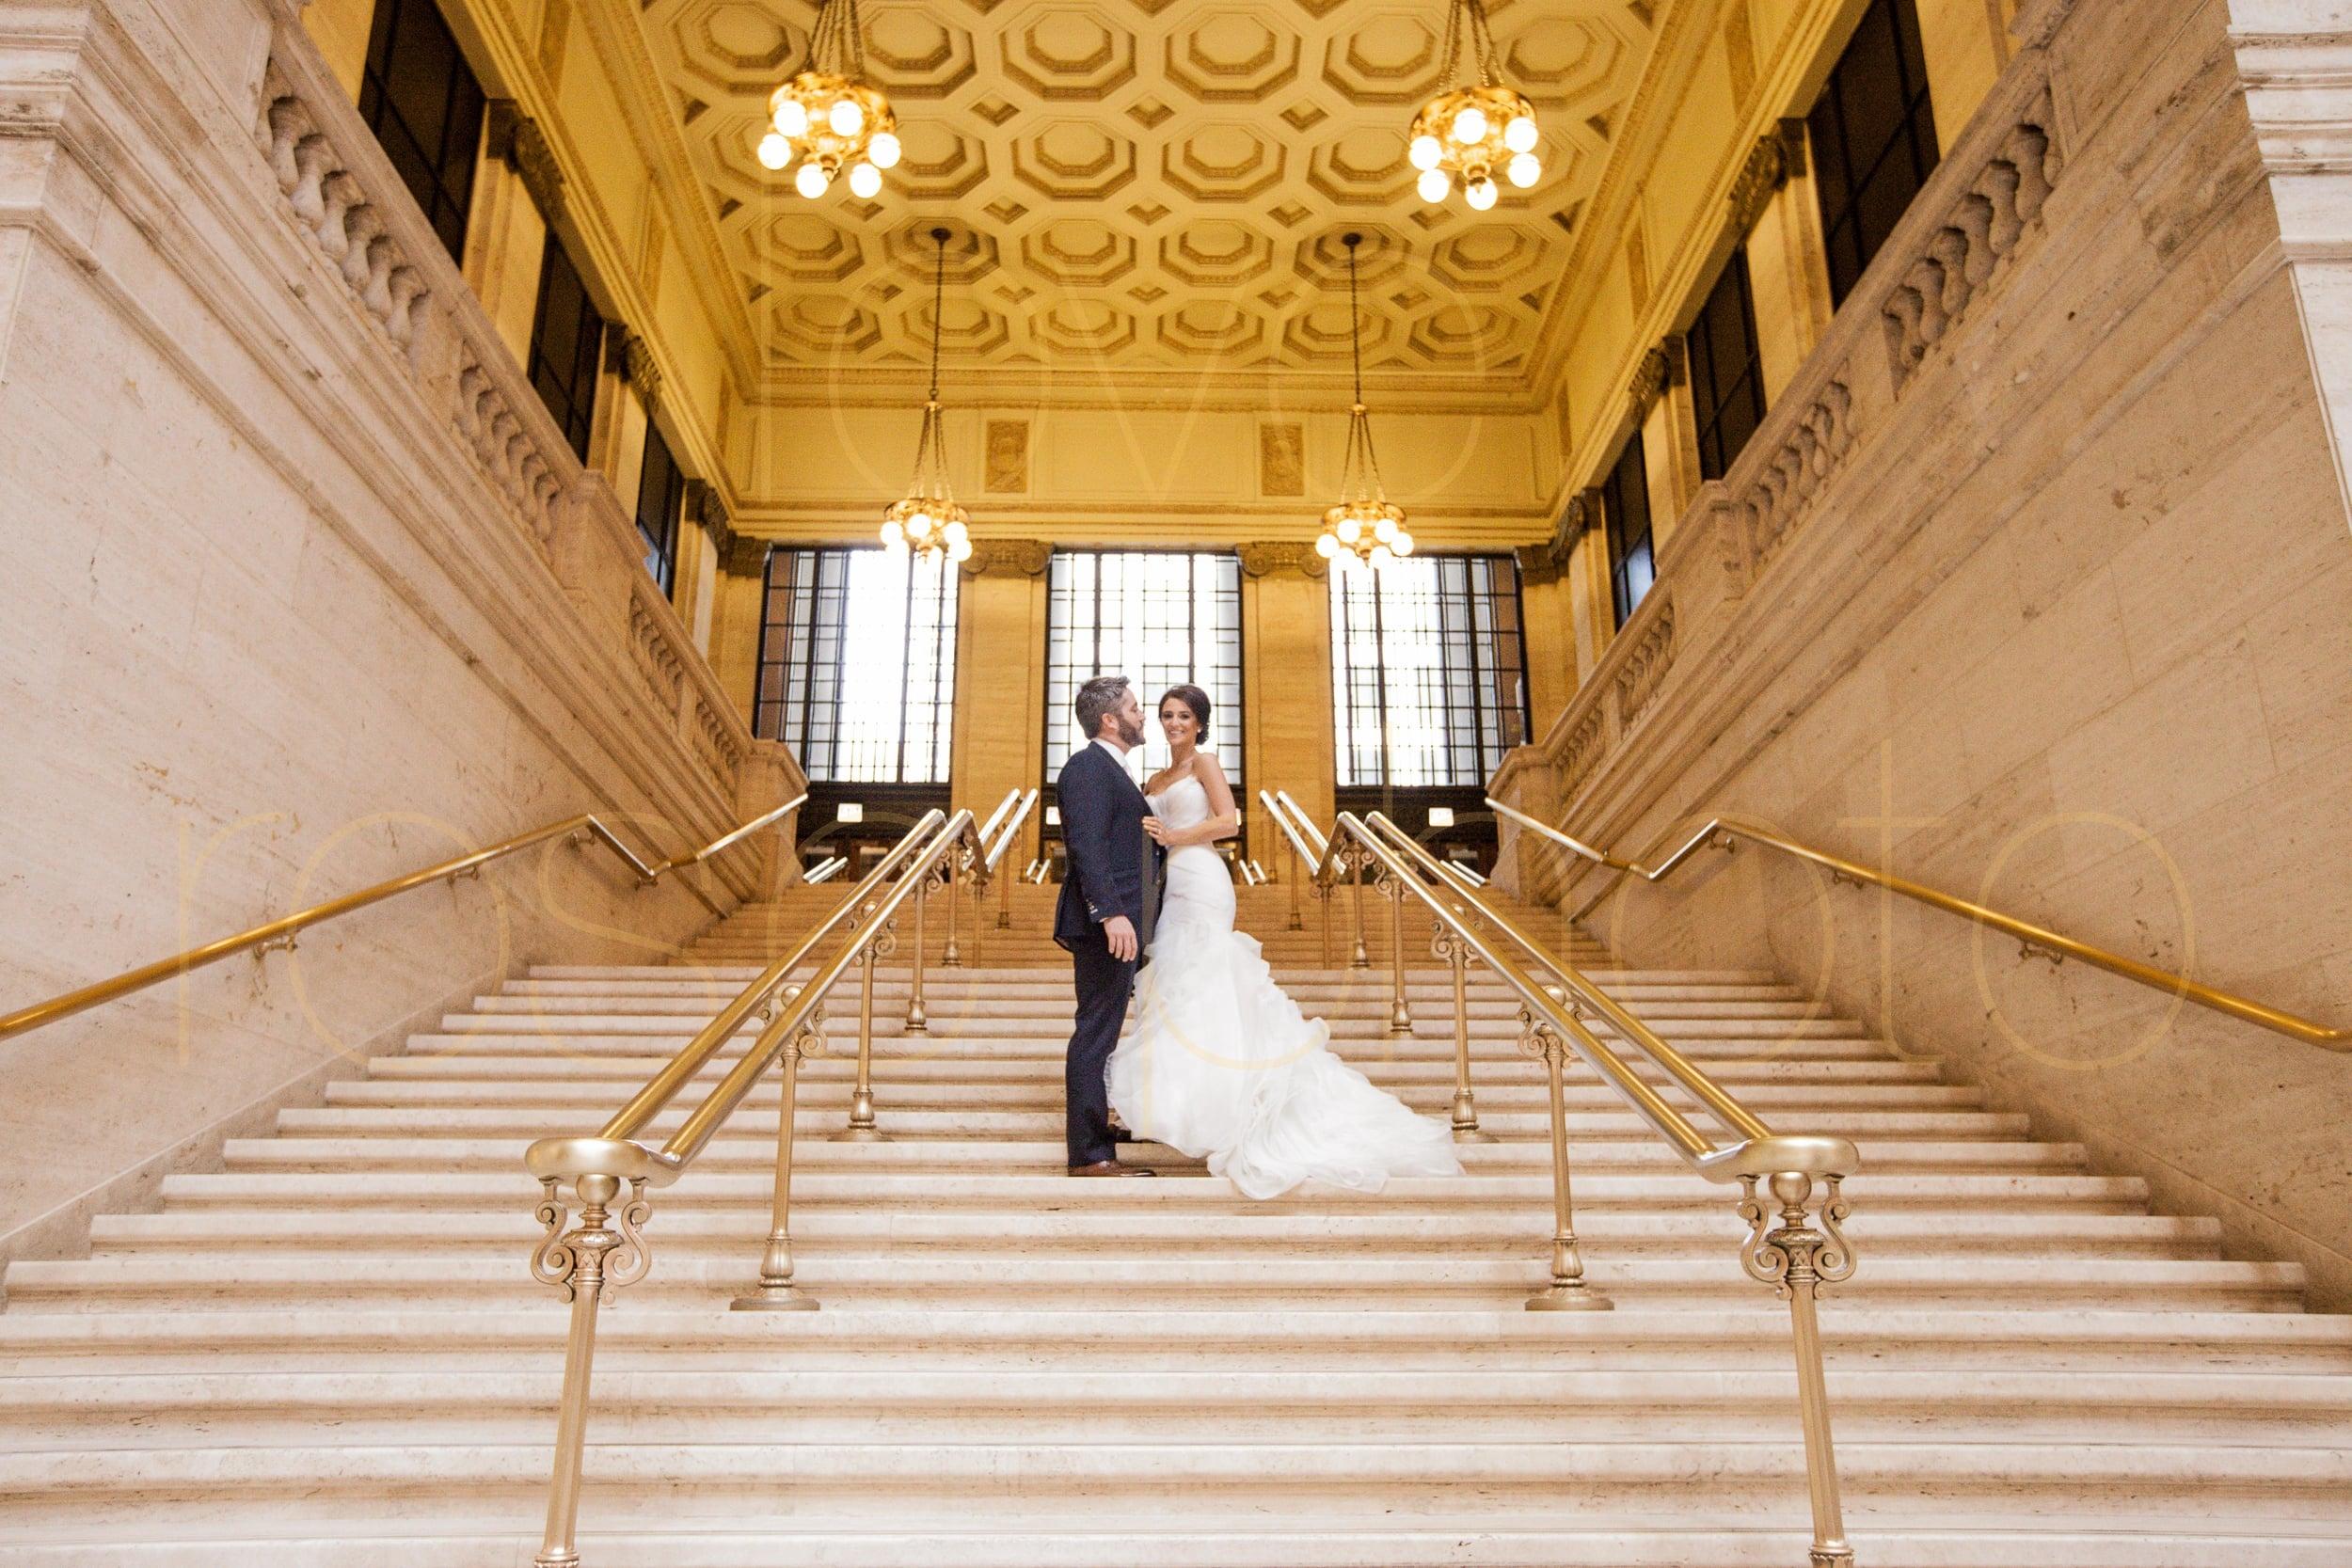 Sarah + Mike NYE wedding Chicago wedding photographer best of glamour modern luxury engagement photos-17.jpg